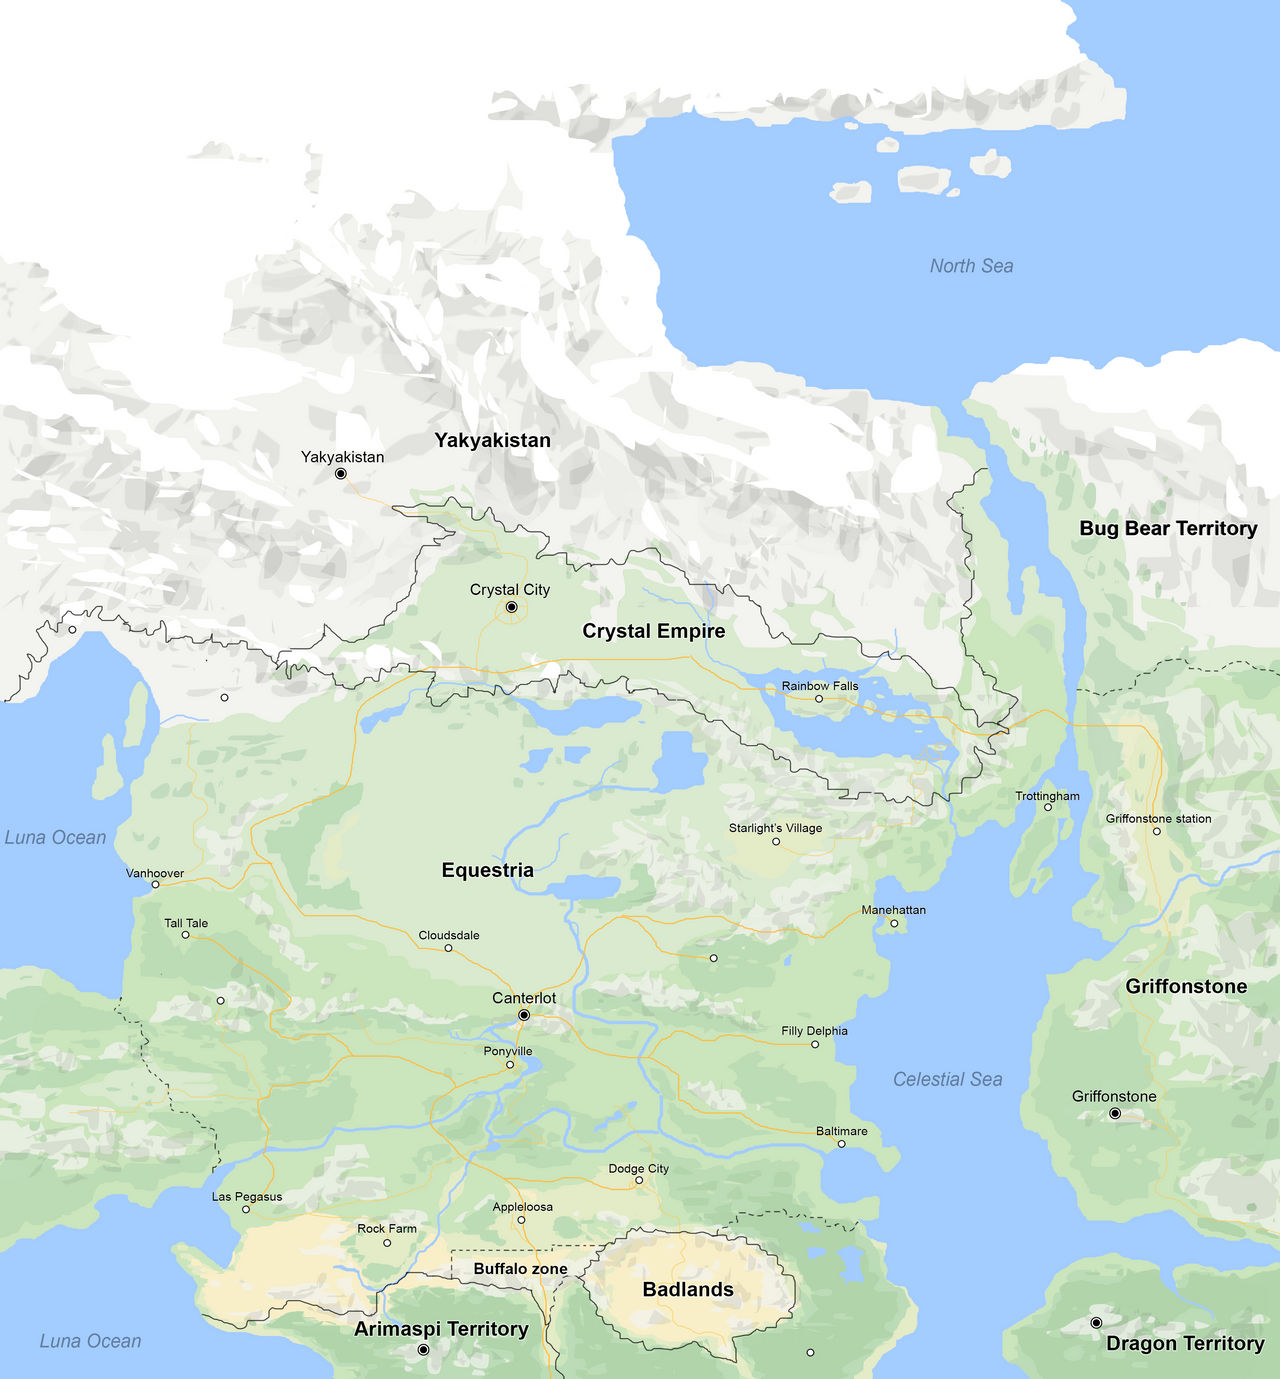 Map of Equestria